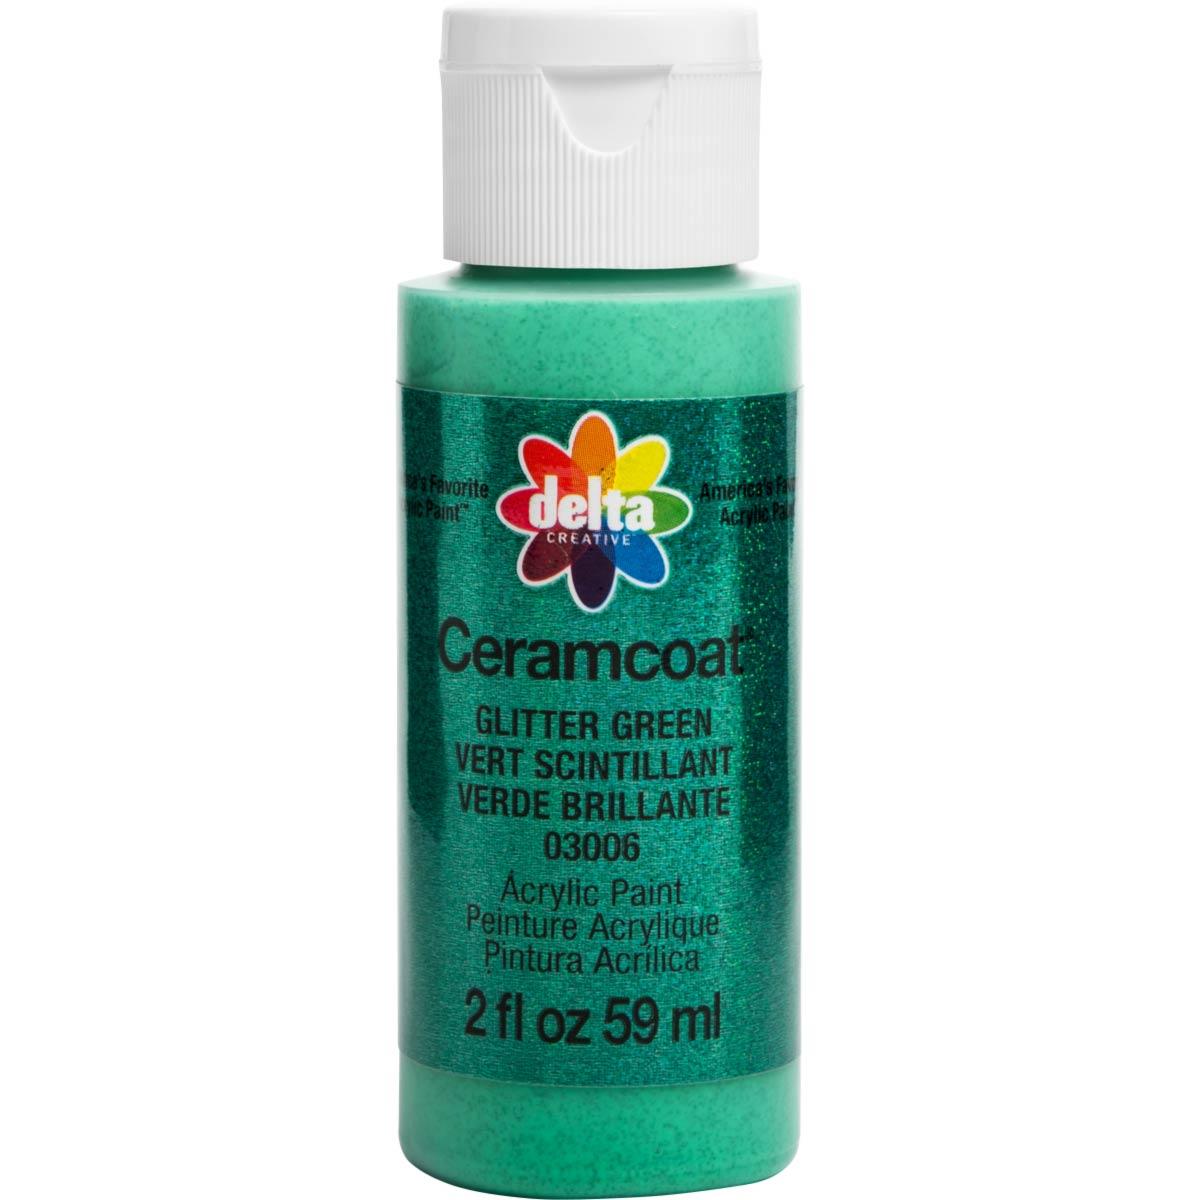 Delta Ceramcoat ® Acrylic Paint - Glitter Green, 2 oz. - 03006